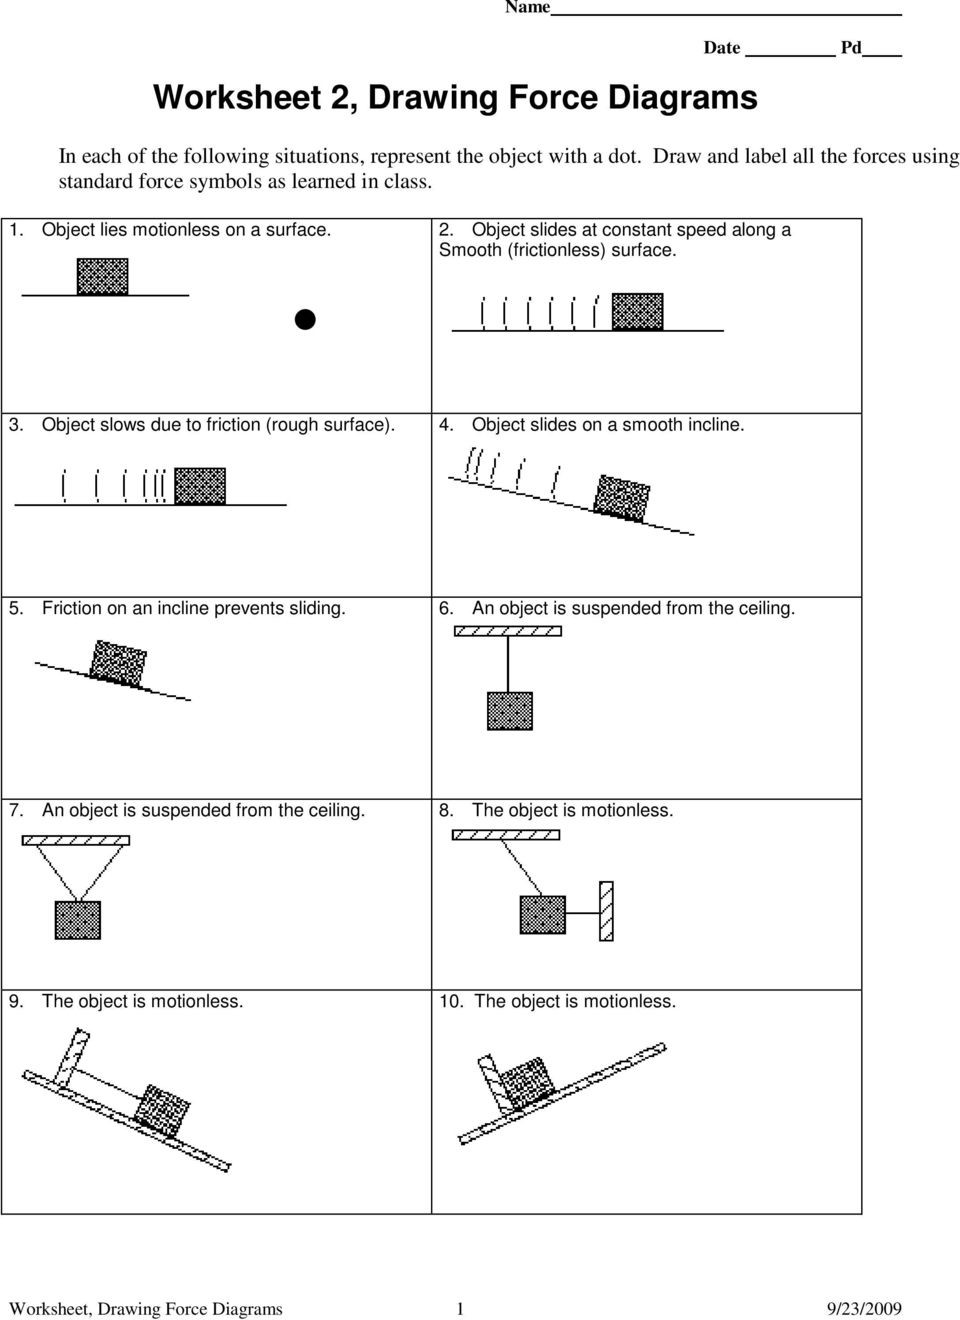 Free Body Diagram Worksheet Answers Free Body Diagram Worksheet Answer Key General Wiring Diagram